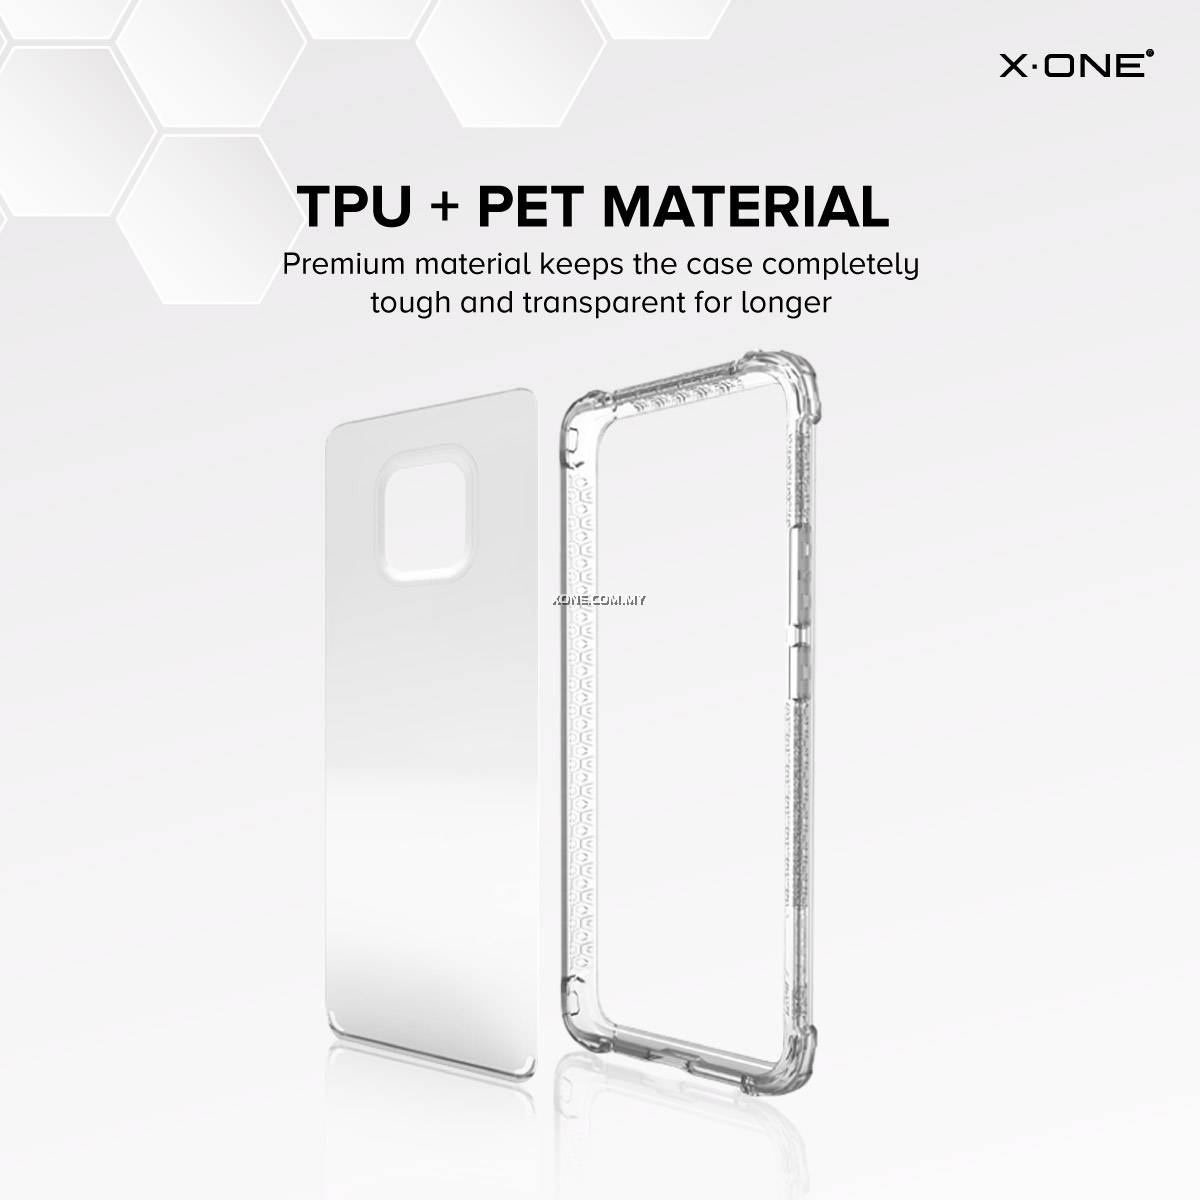 Samsung Galaxy S10e X-One Drop Guard Pro Case